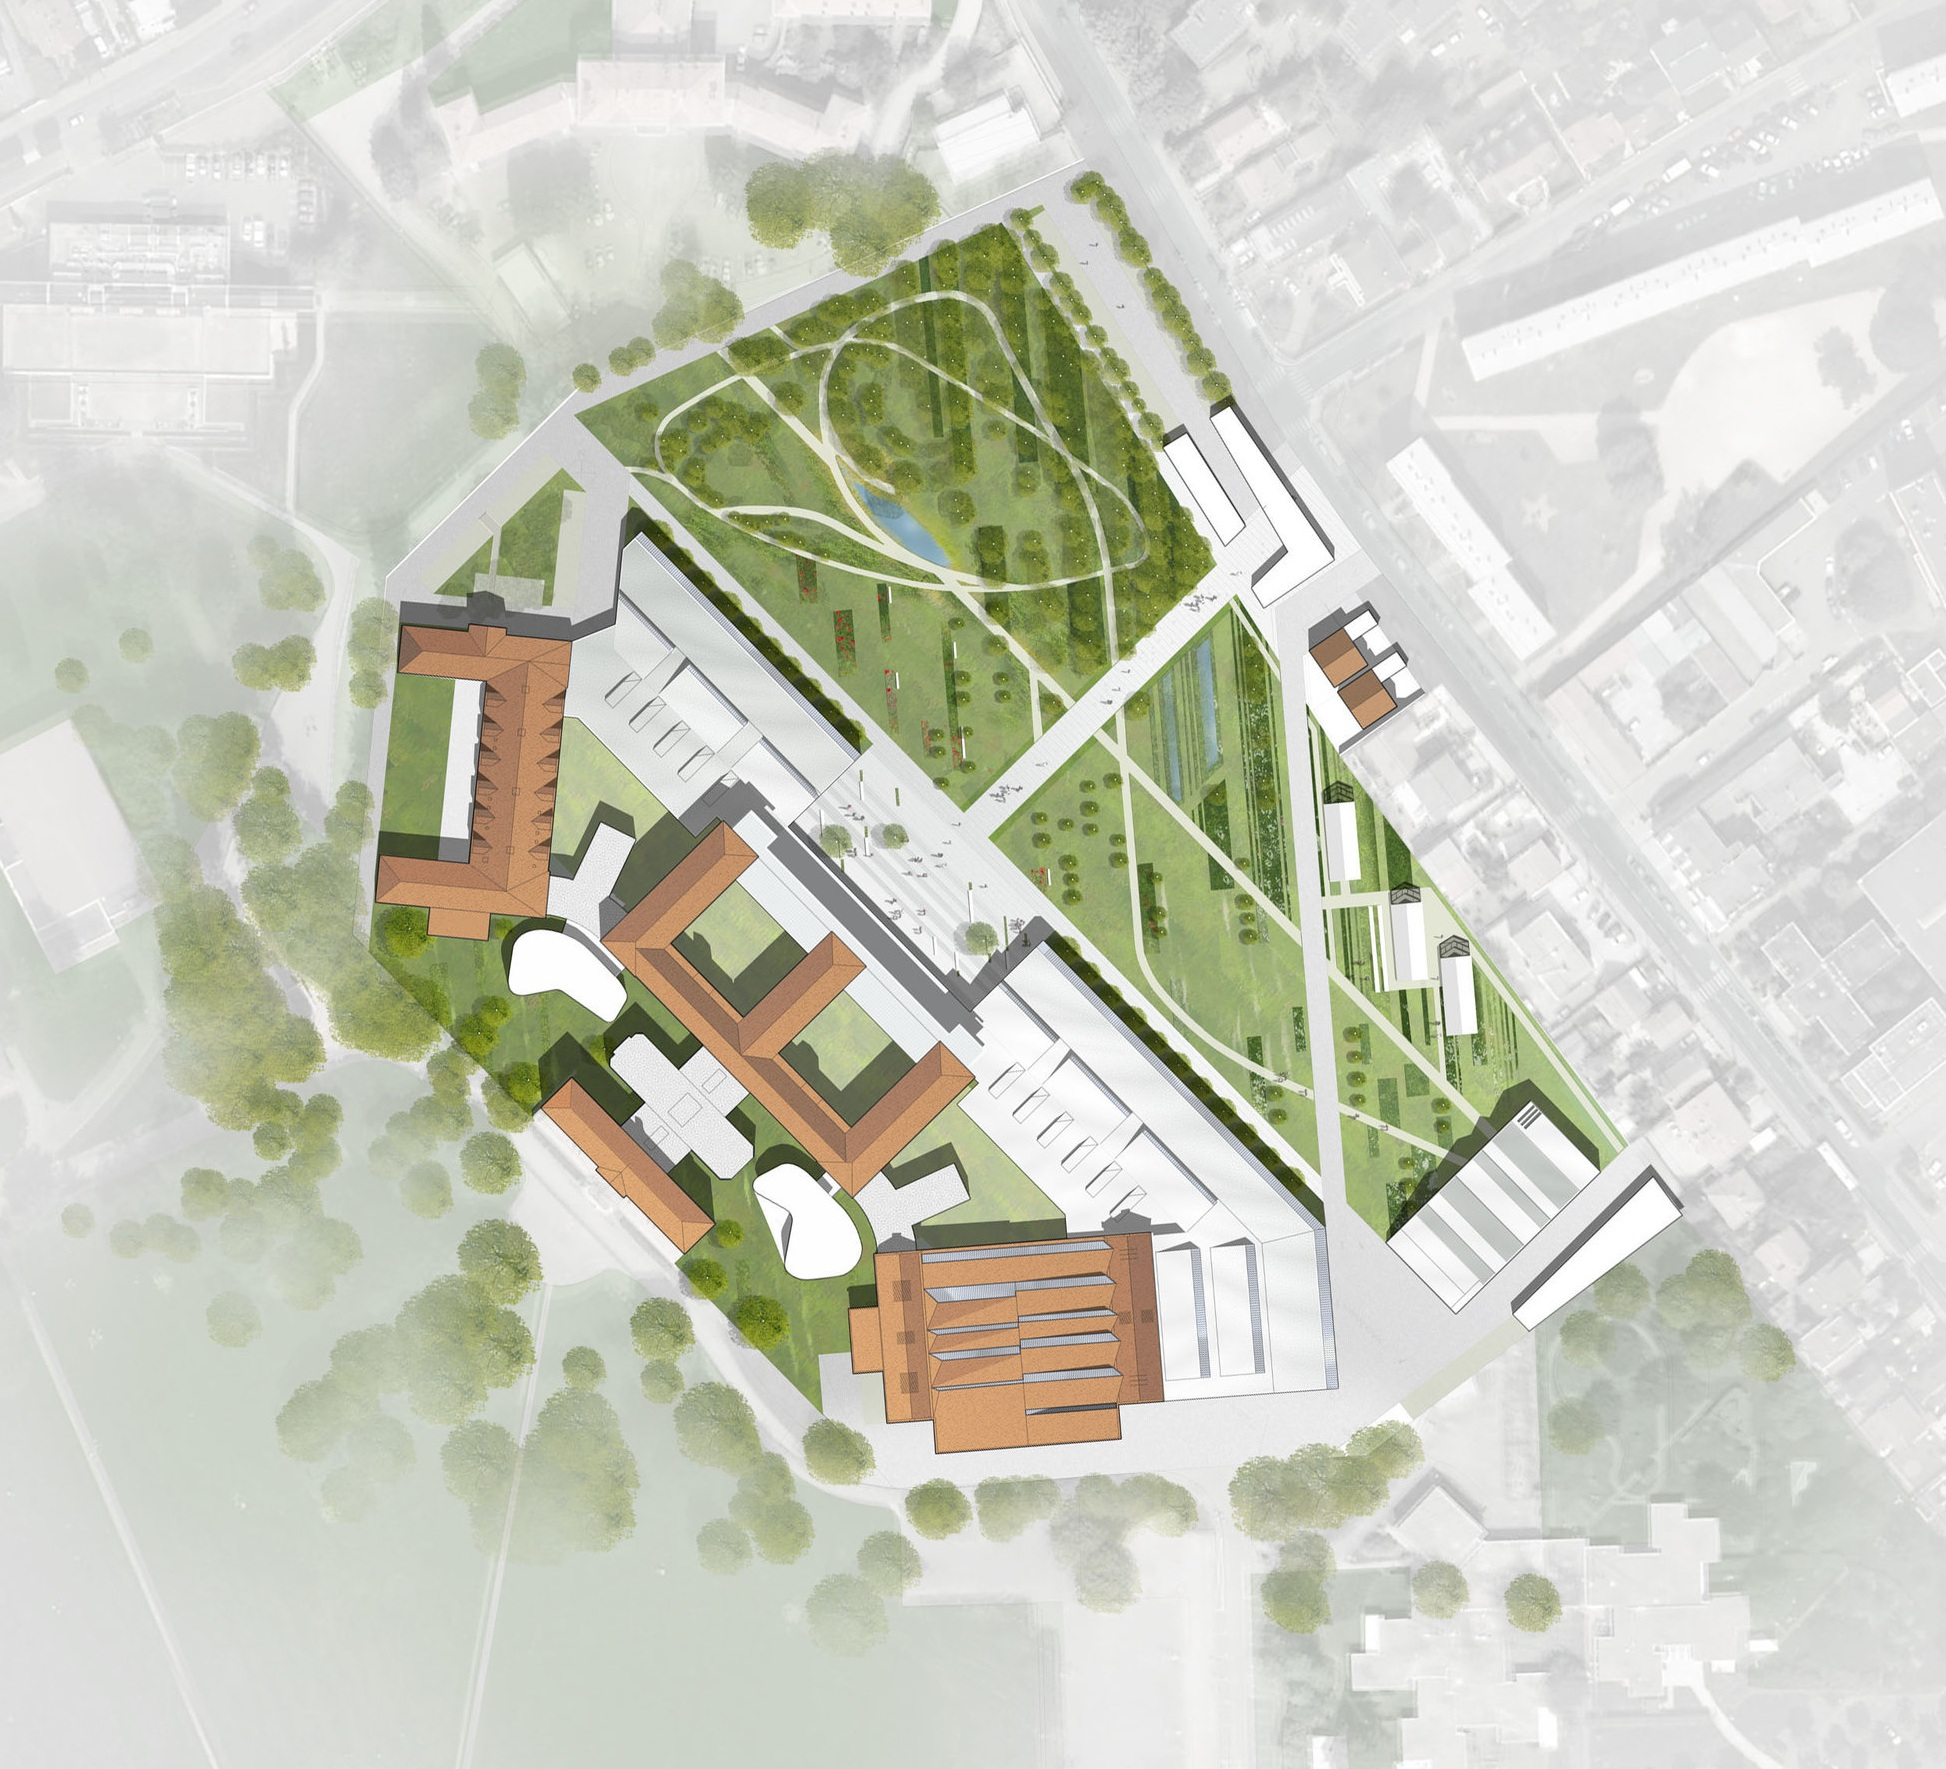 adolphe_cherioux_horticultural_school_vitry_public_outdoor_design_christophe_gautrand_landscape_3.jpg